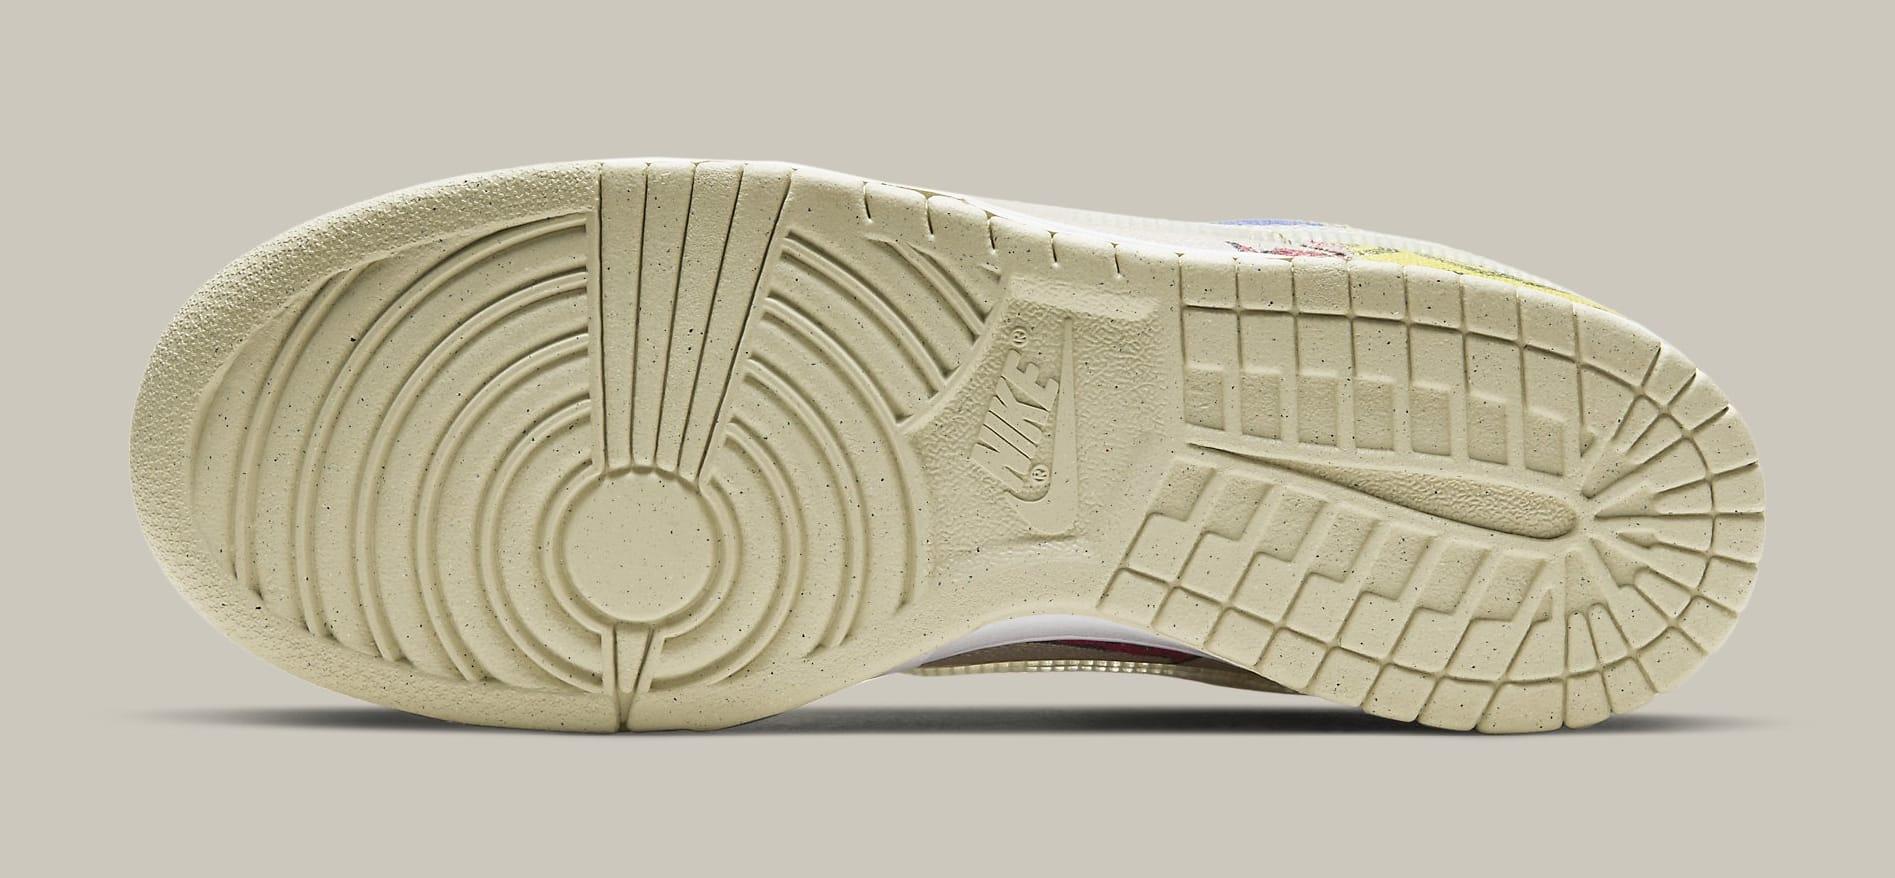 Nike Dunk Low 'City Market' DA6125-900 Outsole